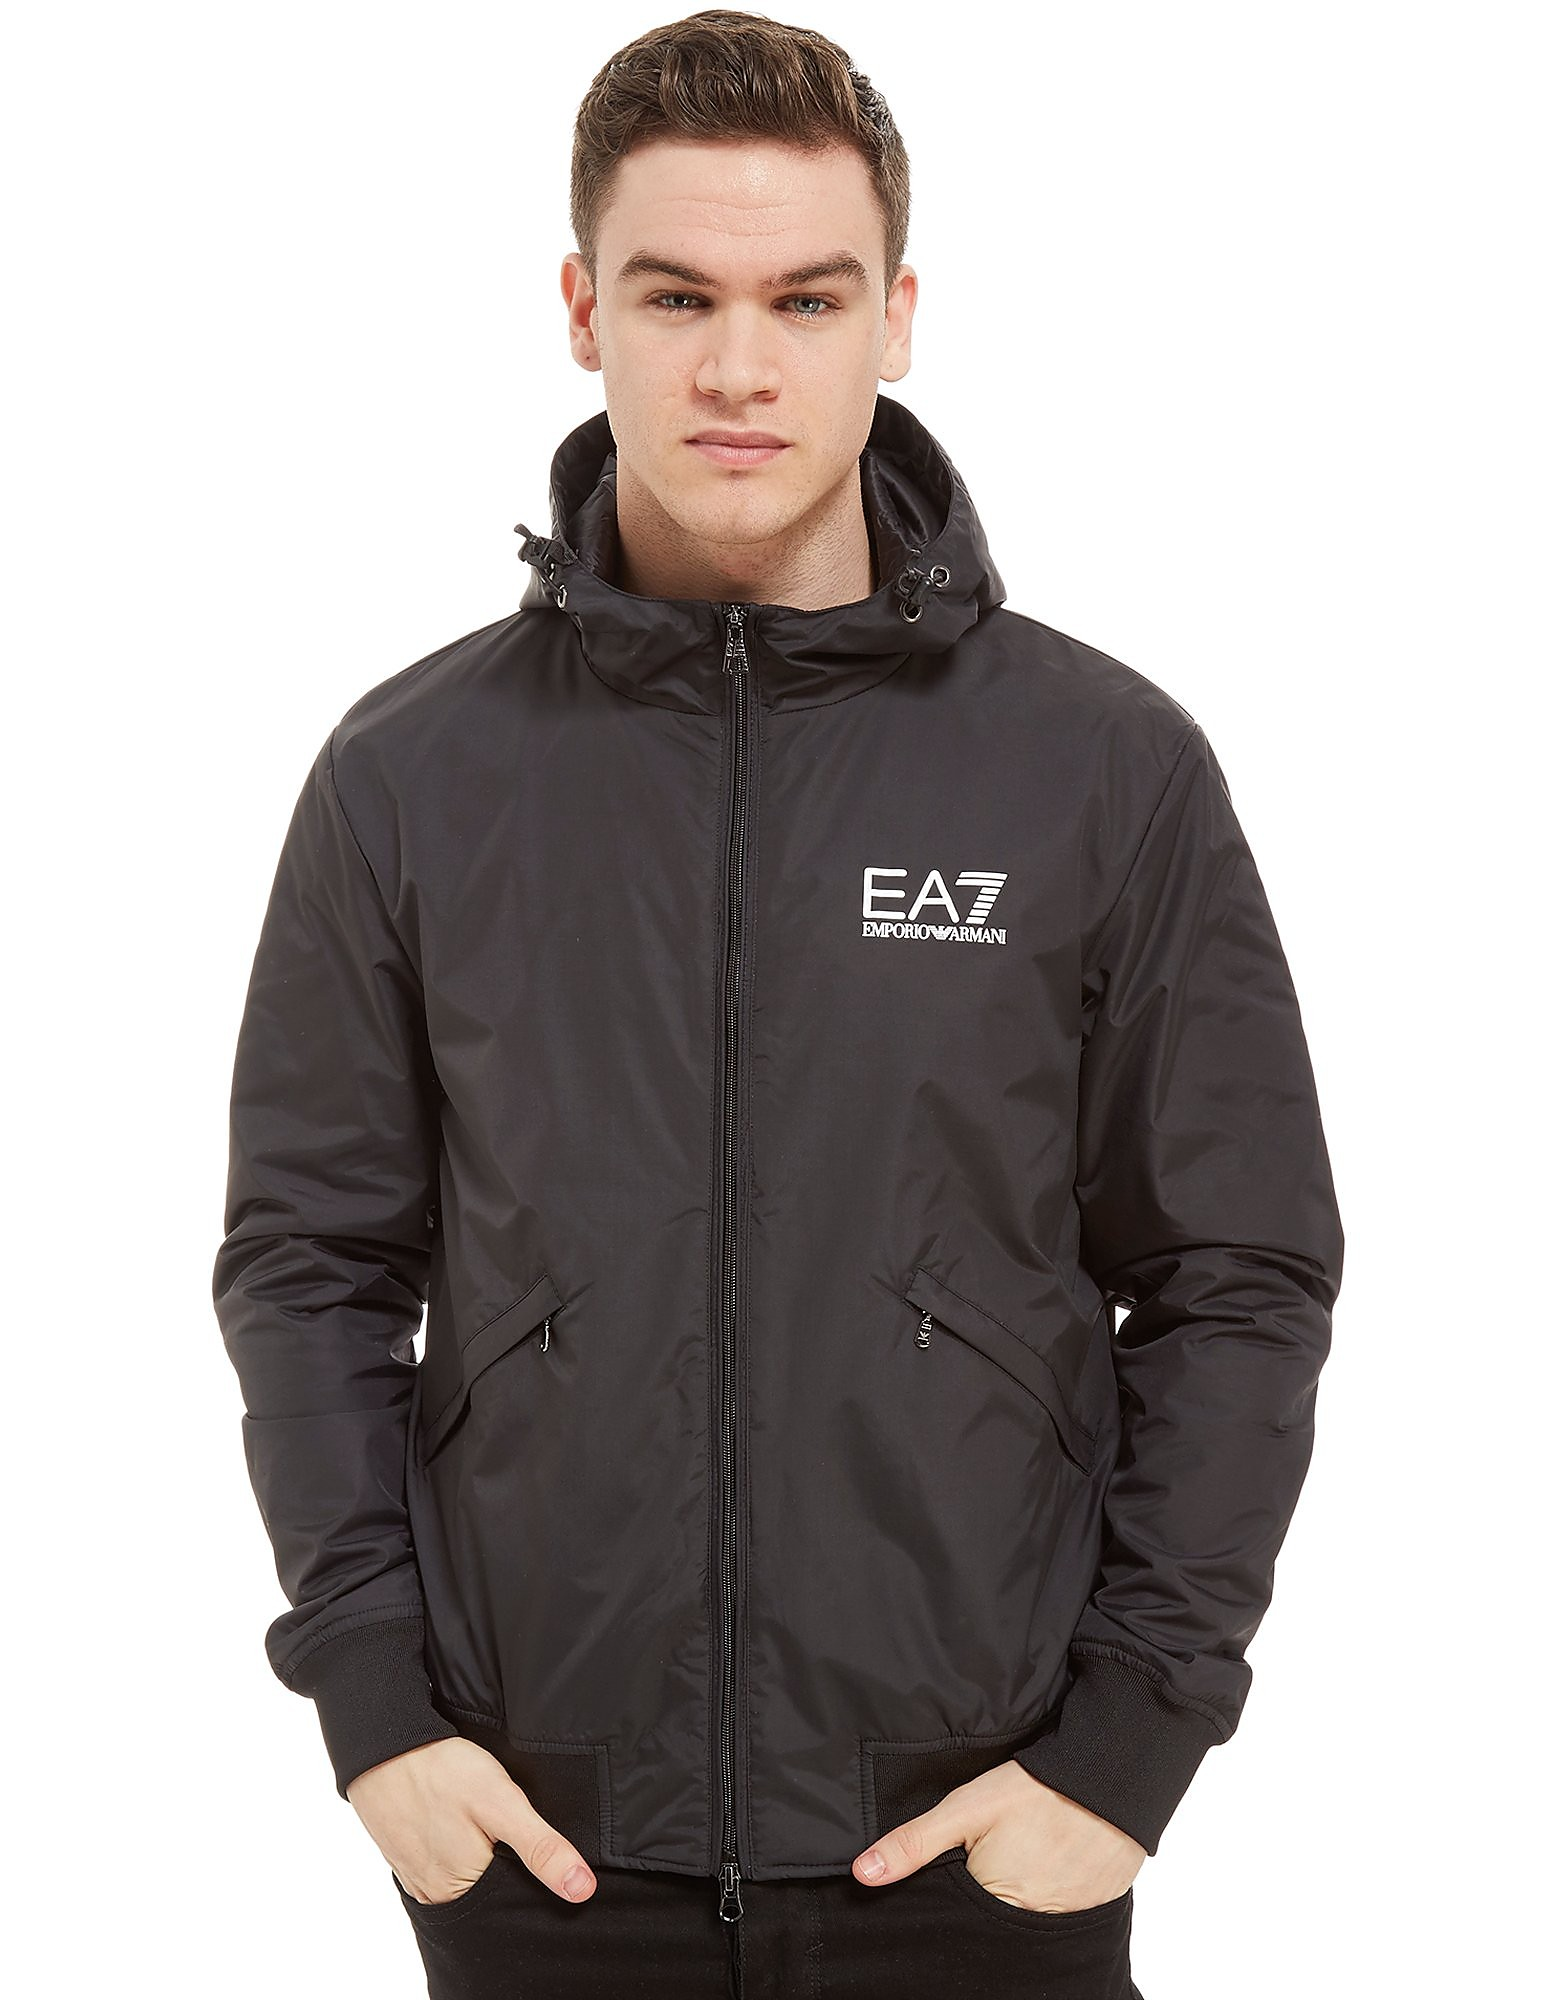 Emporio Armani EA7 Core Hooded Padded Jacket